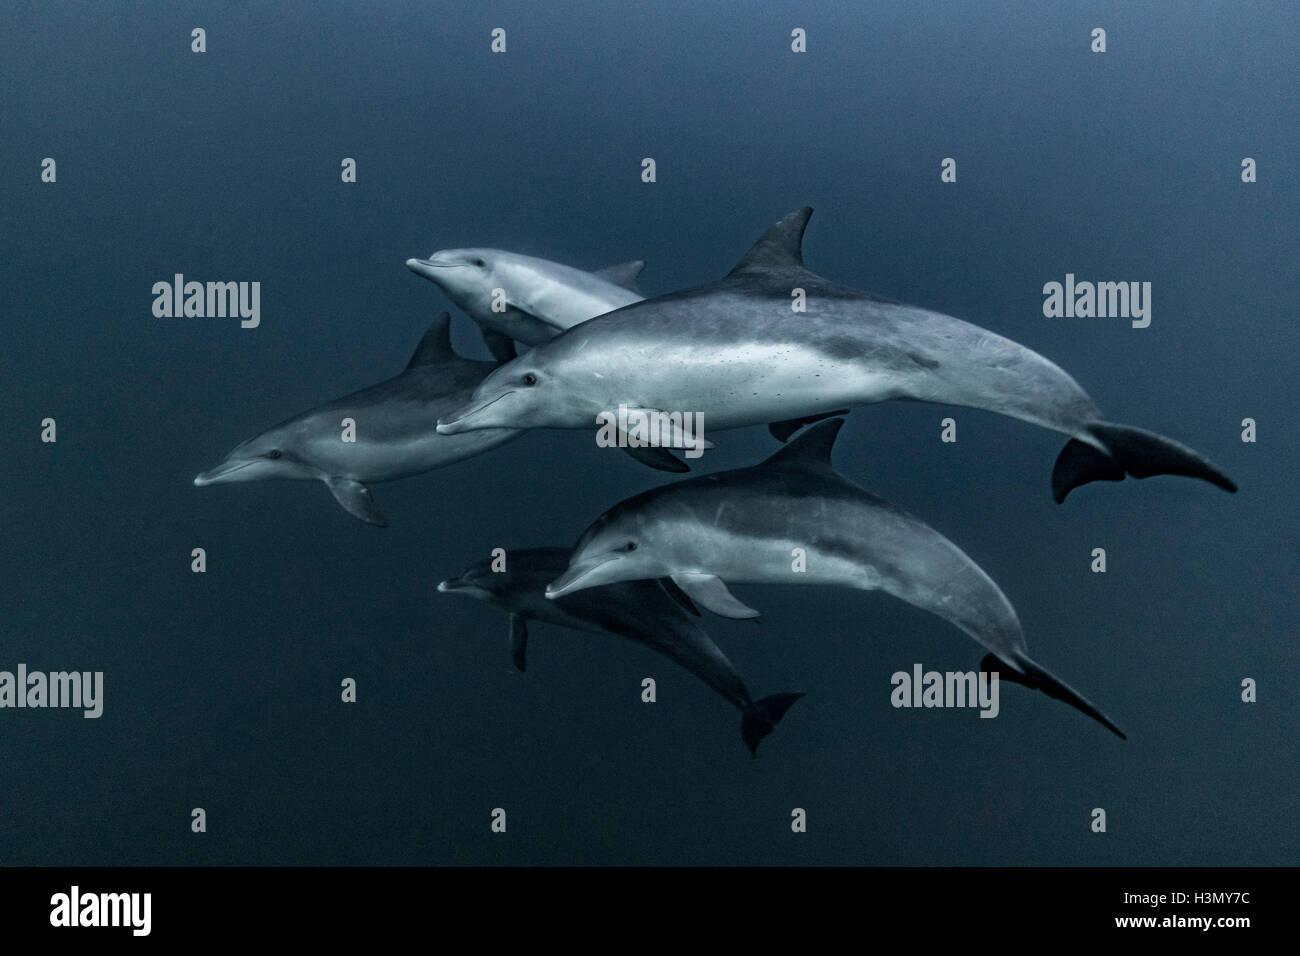 Pod de delfines comunes de caza, Port St Johns, Sudáfrica Imagen De Stock